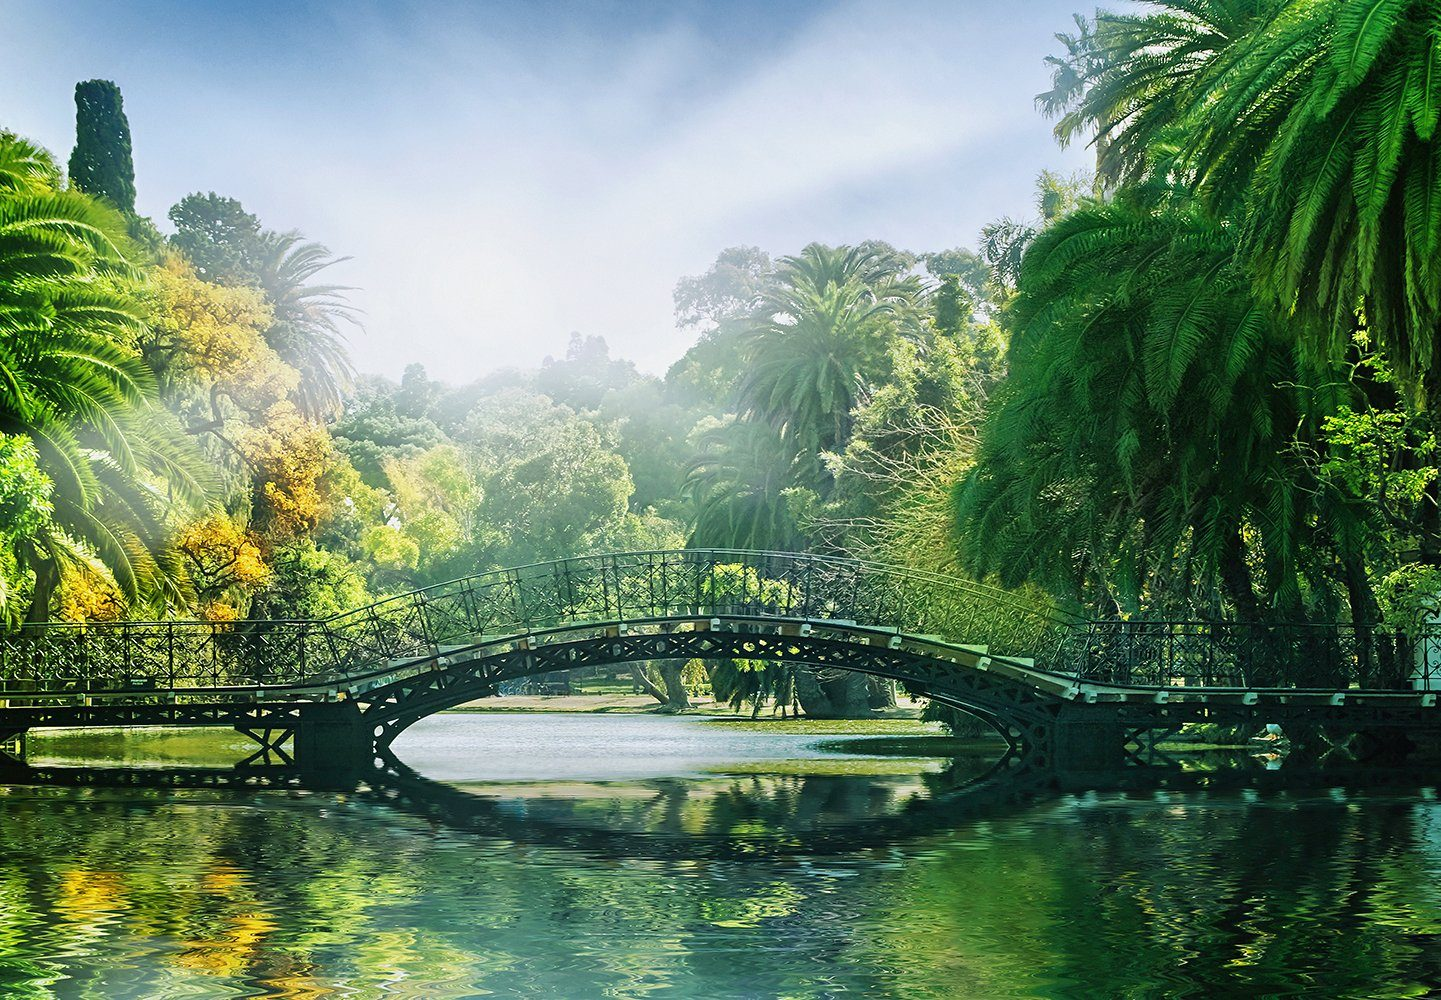 Fototapete »Bridge in the Sunlight«, 8-teilig, 366x254 cm